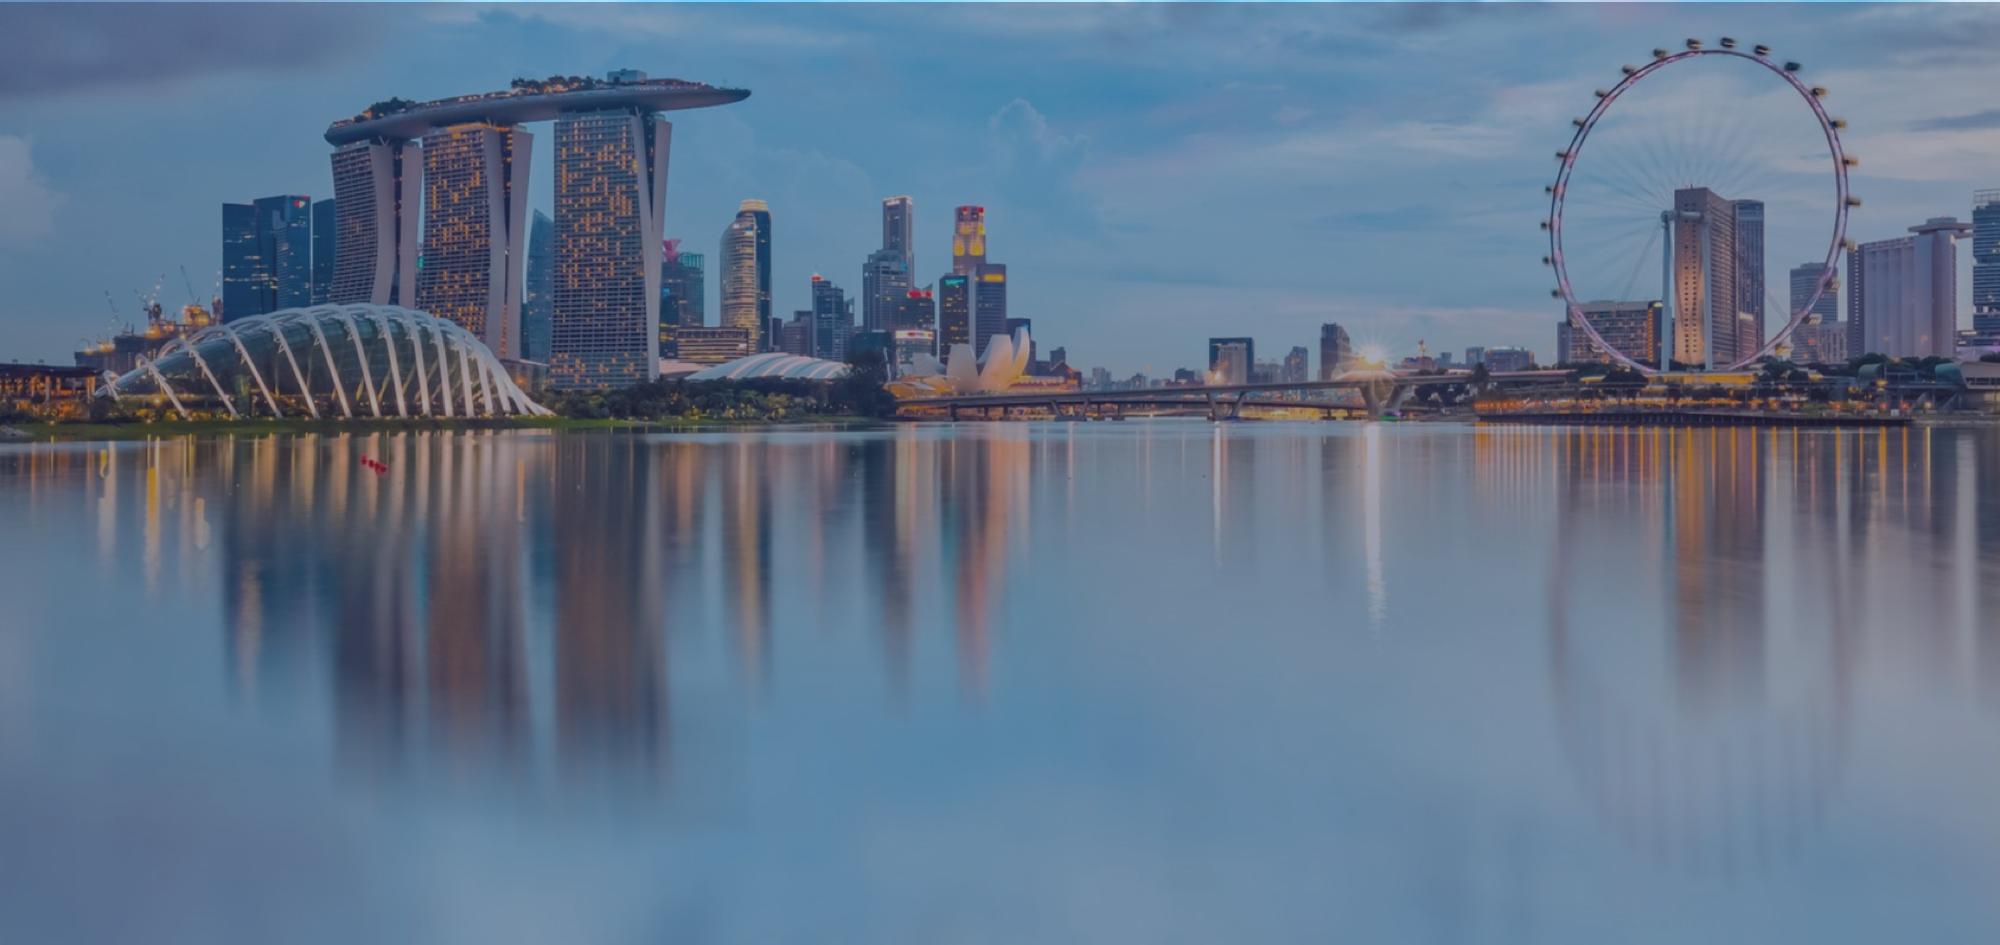 B2B Inbound Digital Marketing Agency in Singapore - B2BML